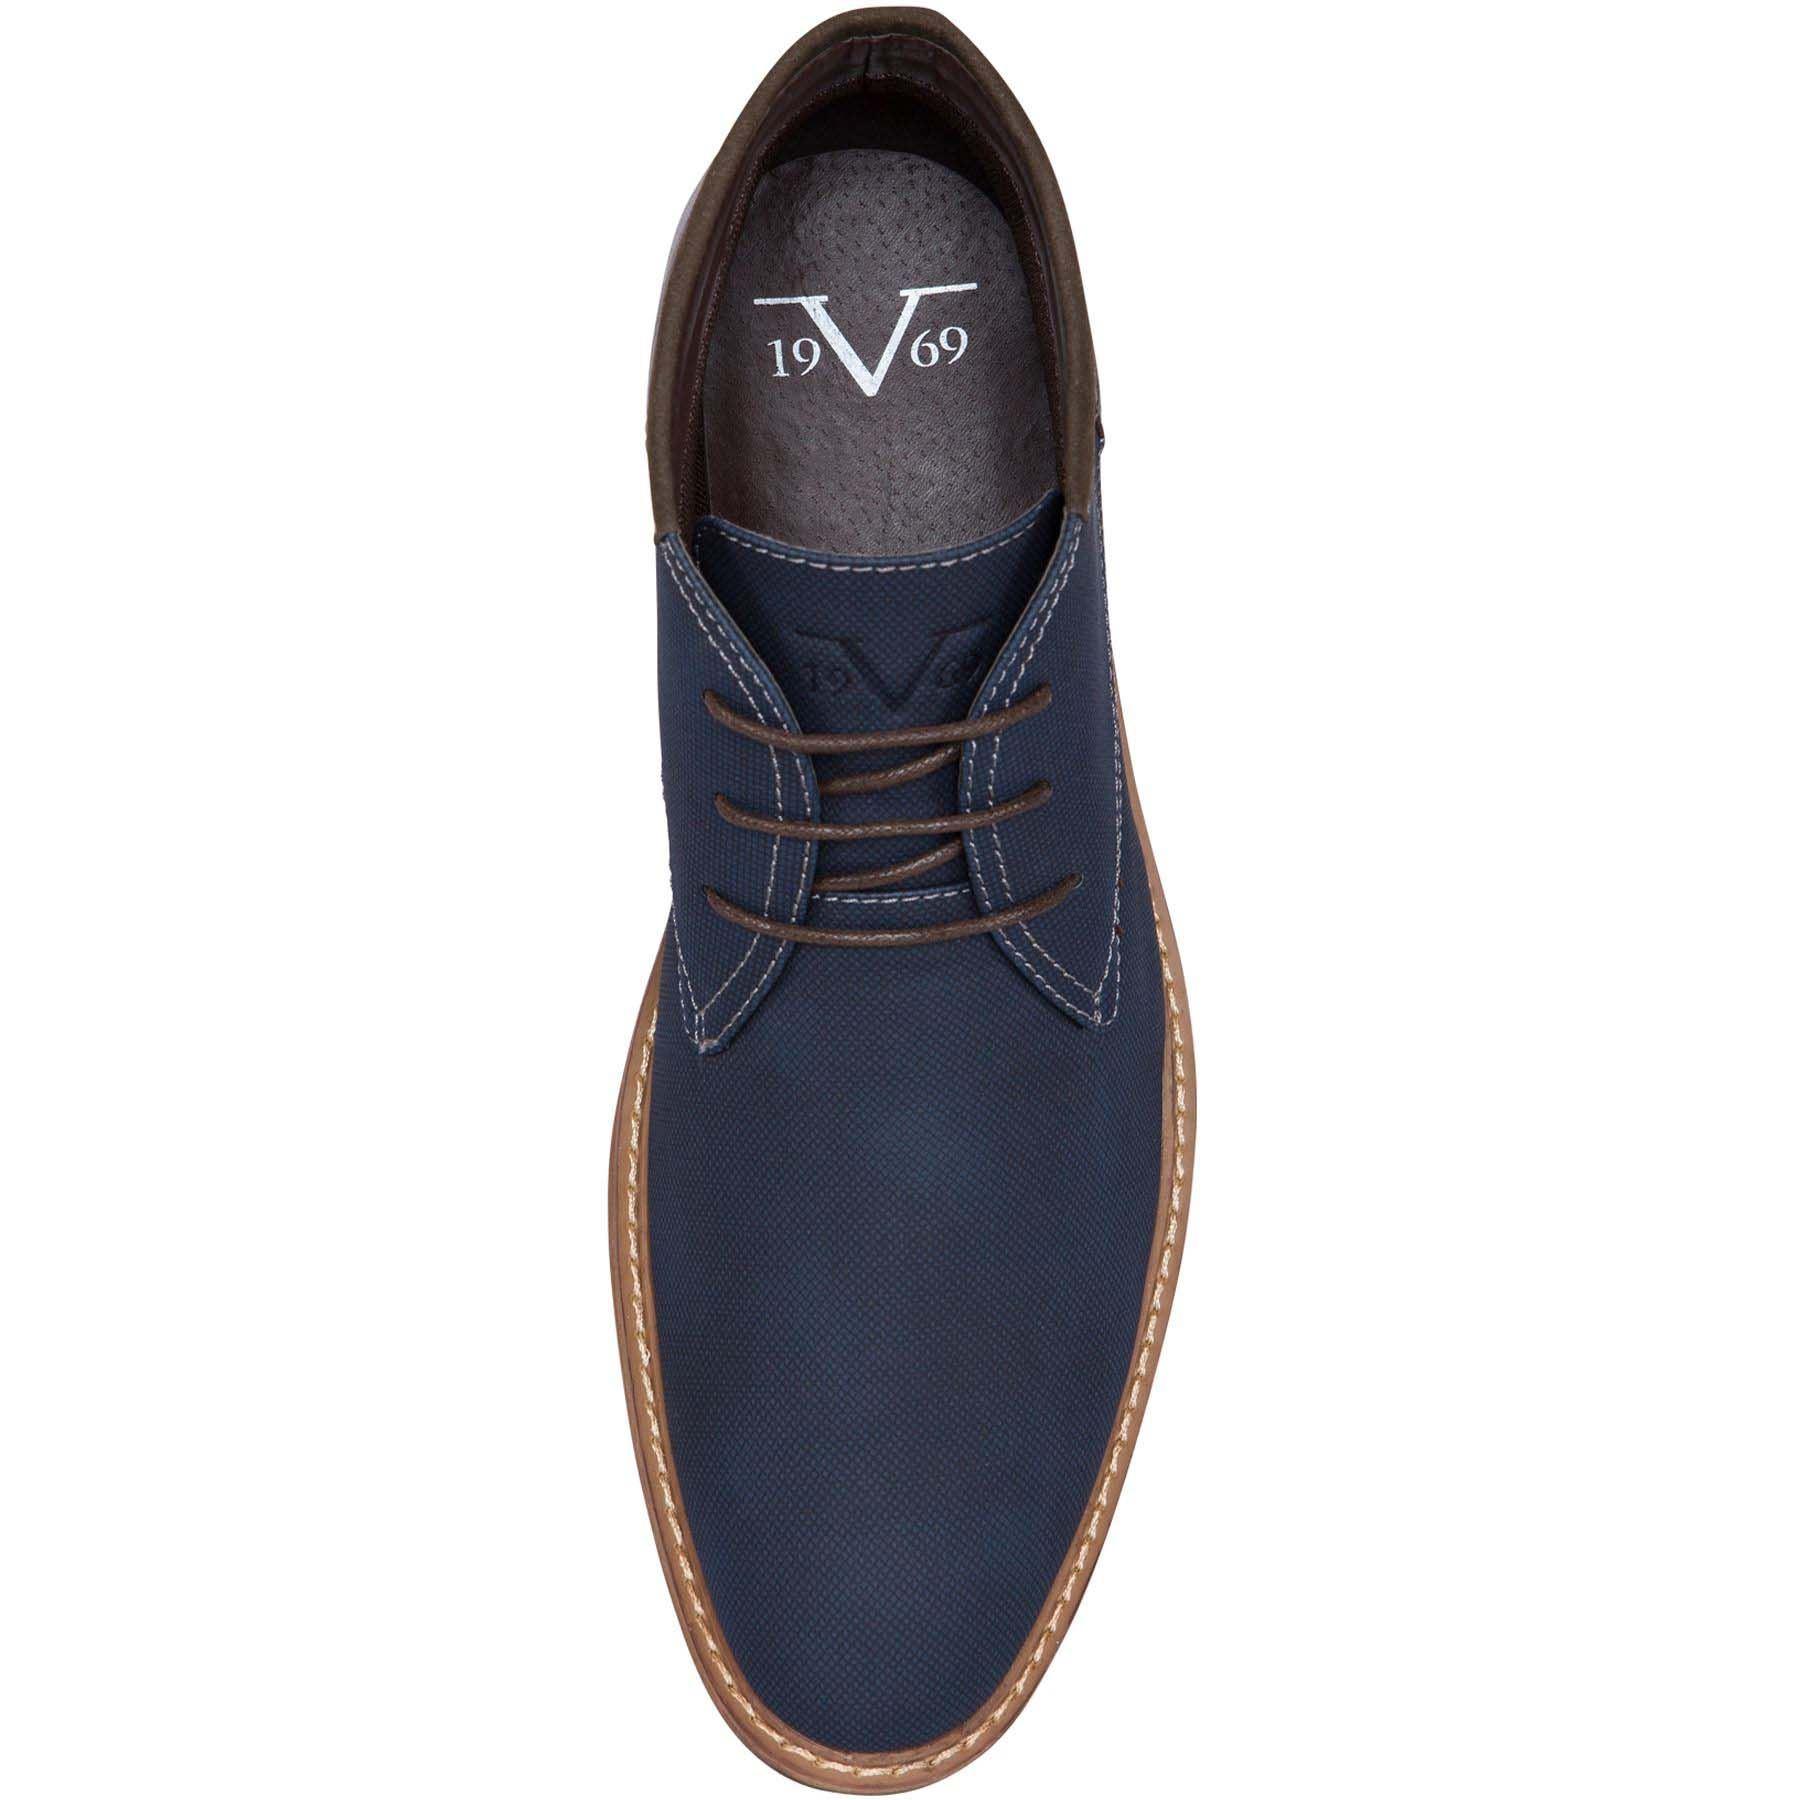 19V69 Chaussures homme 41 Bleu marine 20748125795